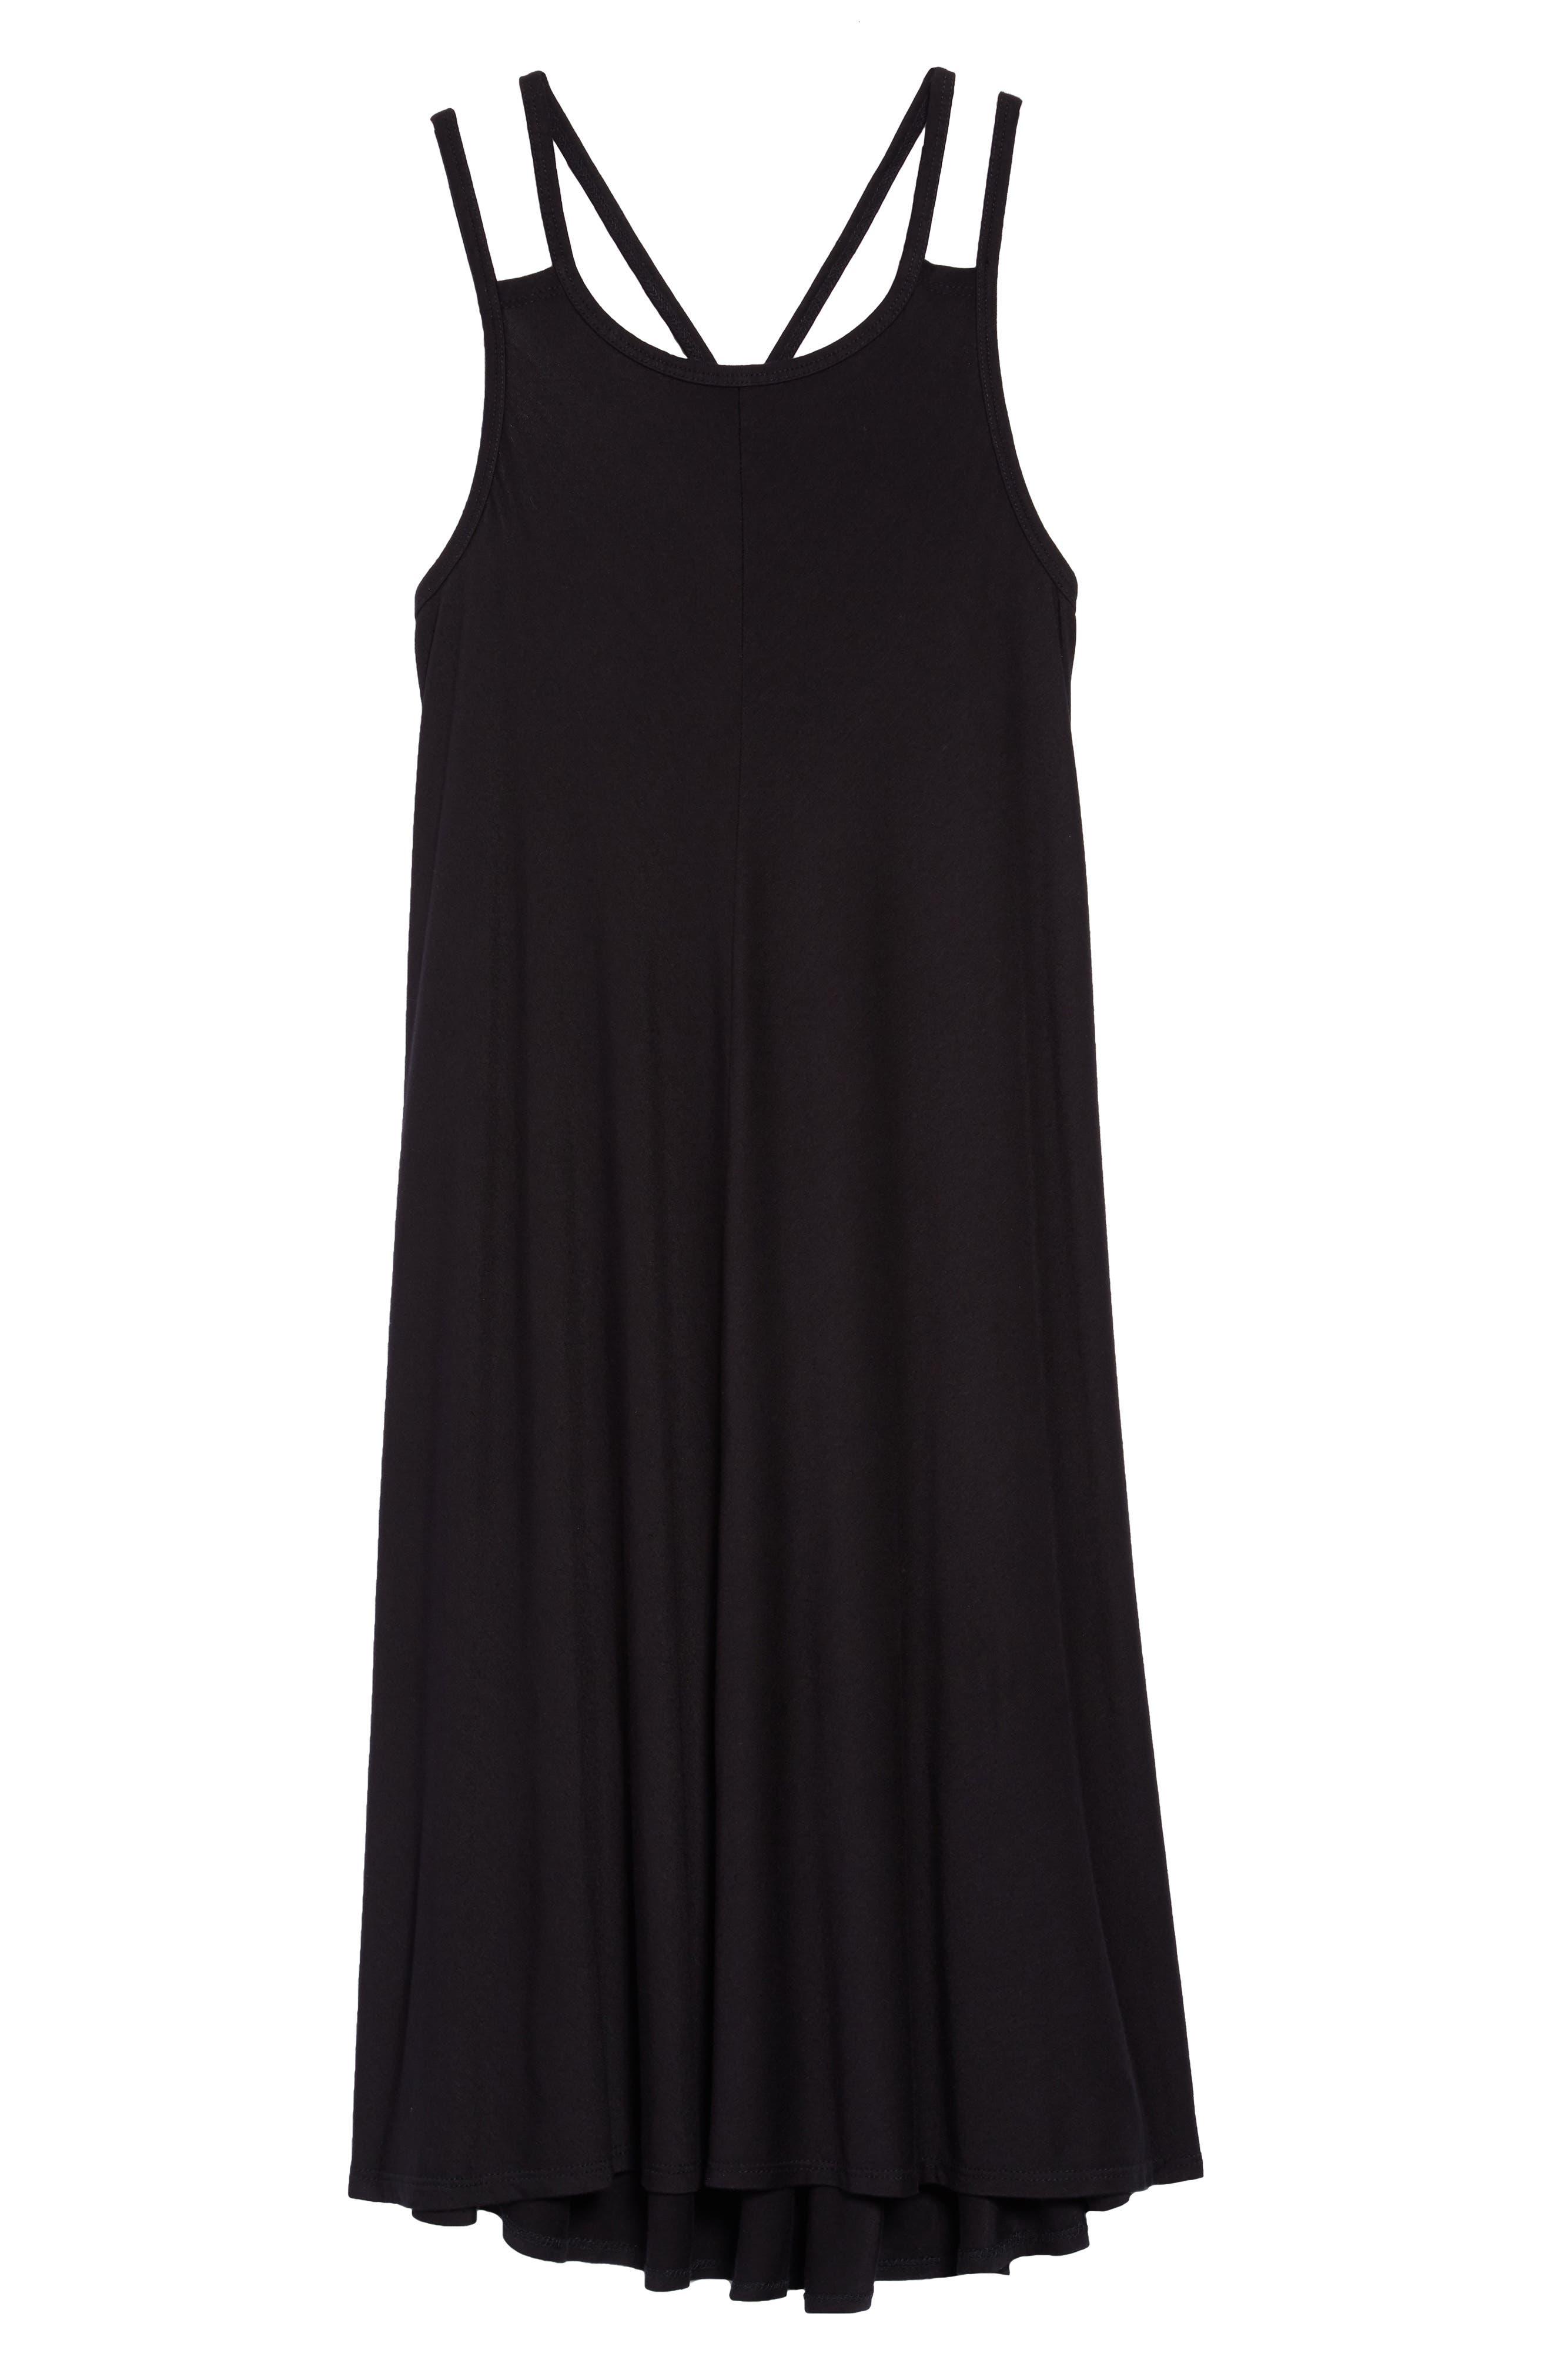 Strappy Dress,                         Main,                         color, Black